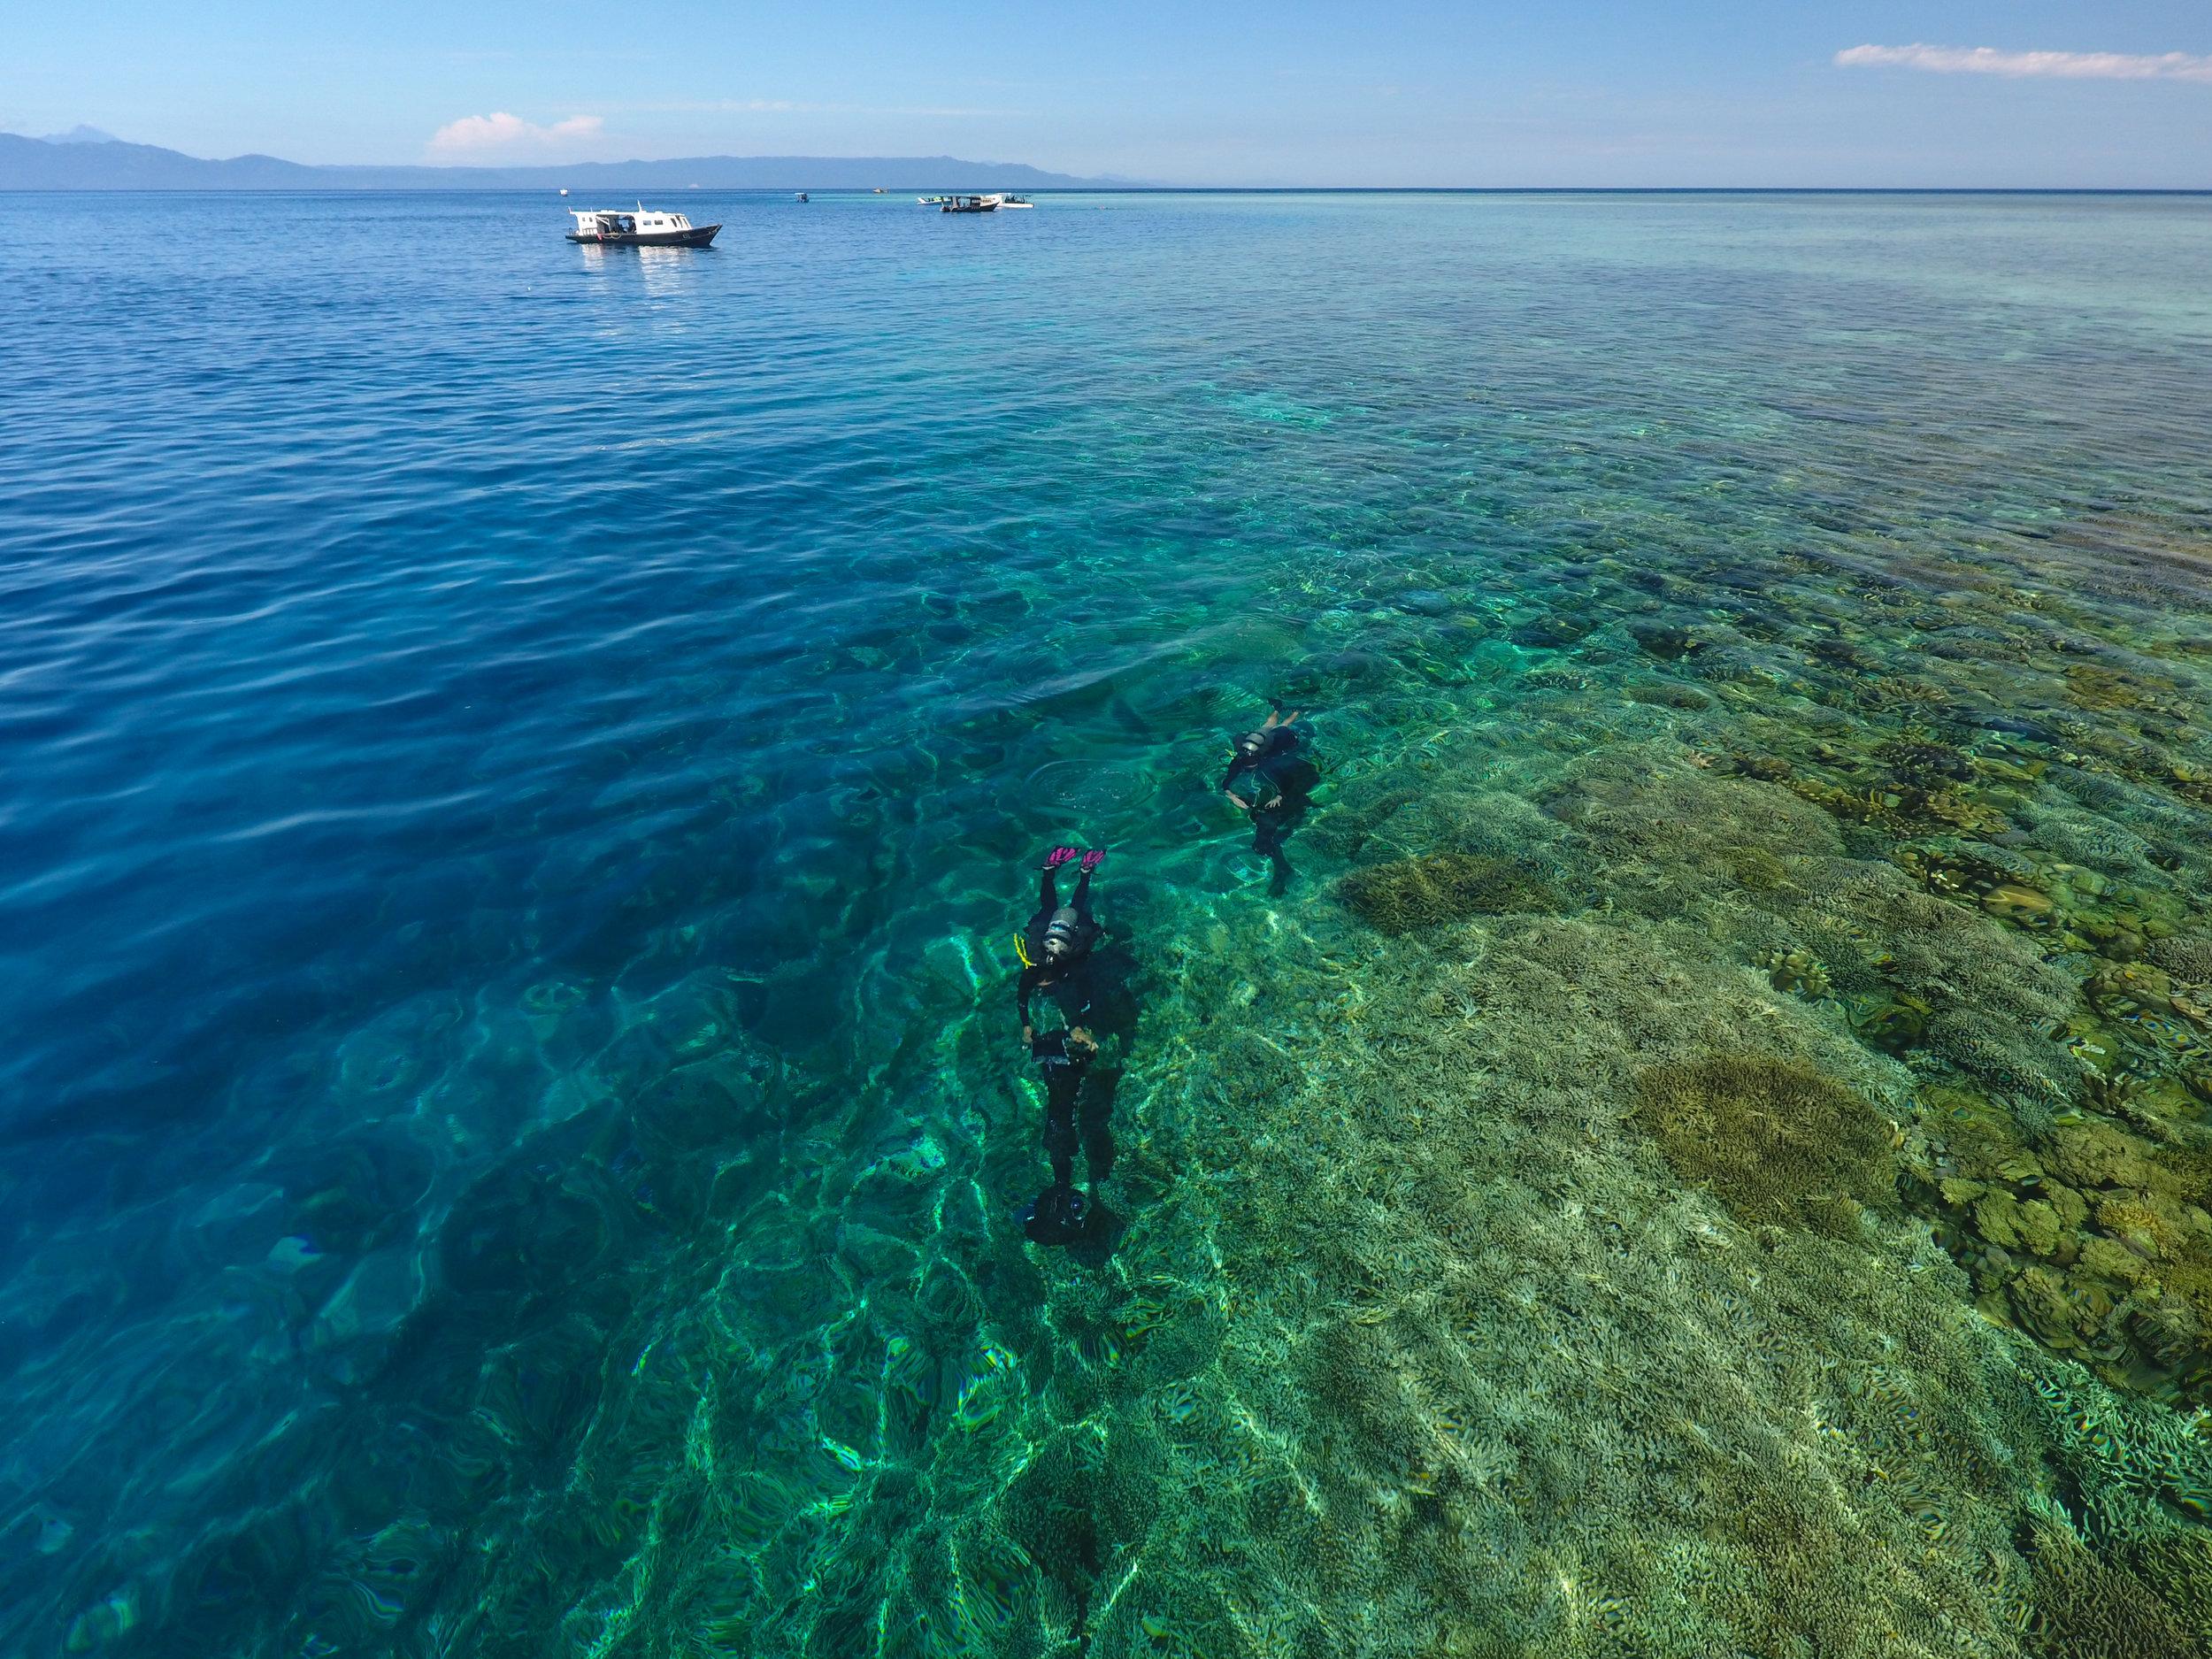 09 - divers seen from above the water CREDIT: The Ocean Agency / paul g. allen philanthropies